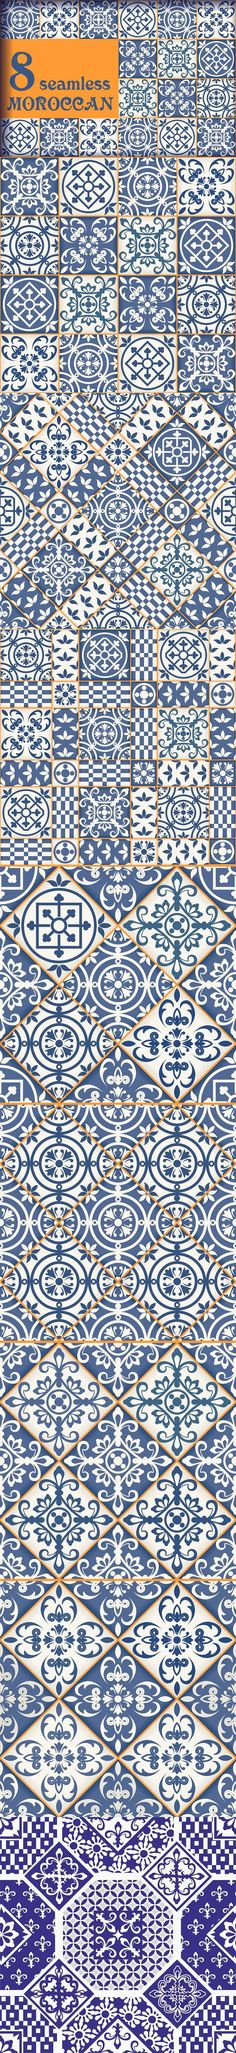 8 seamless Moroccan tile pattern. Patterns